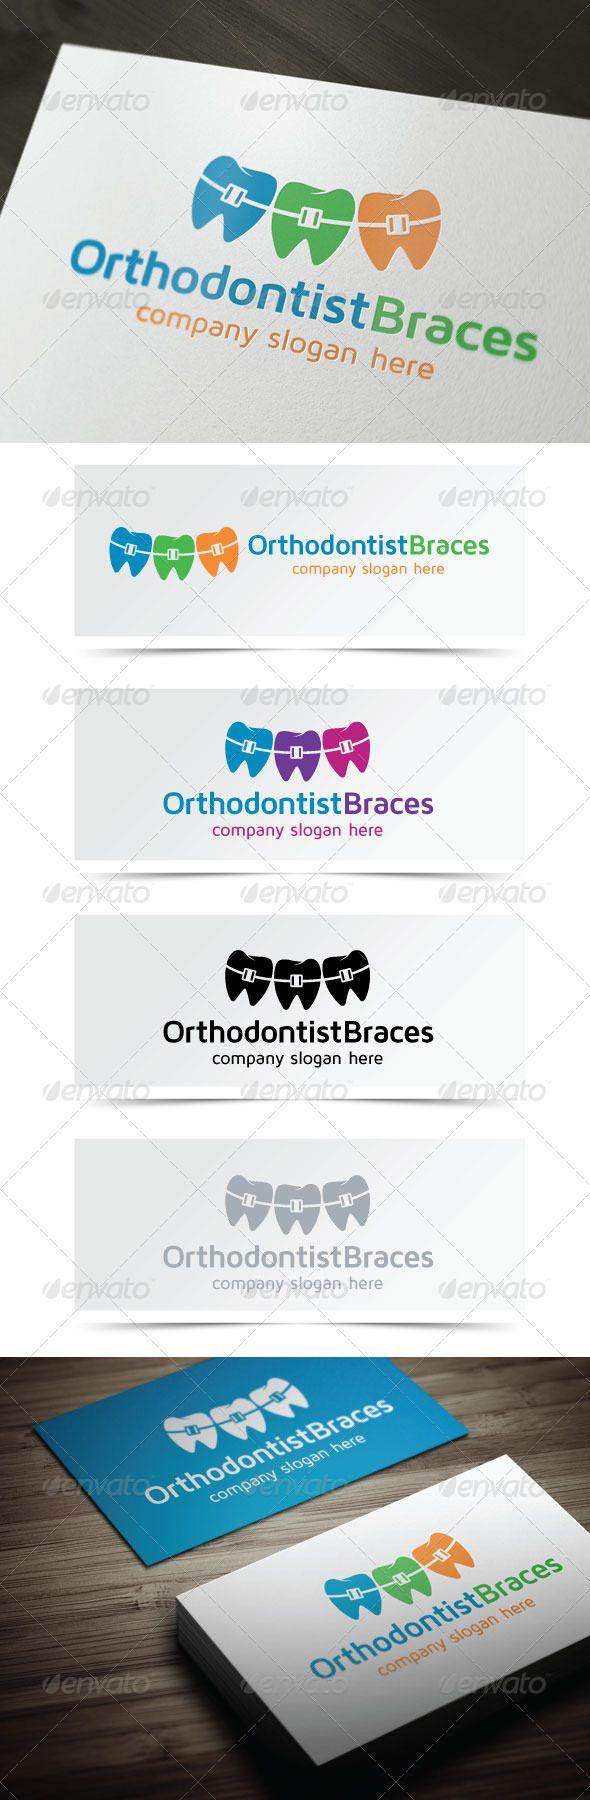 Orthodontist Braces http://graphicriver.net/user/debo243/portfolio